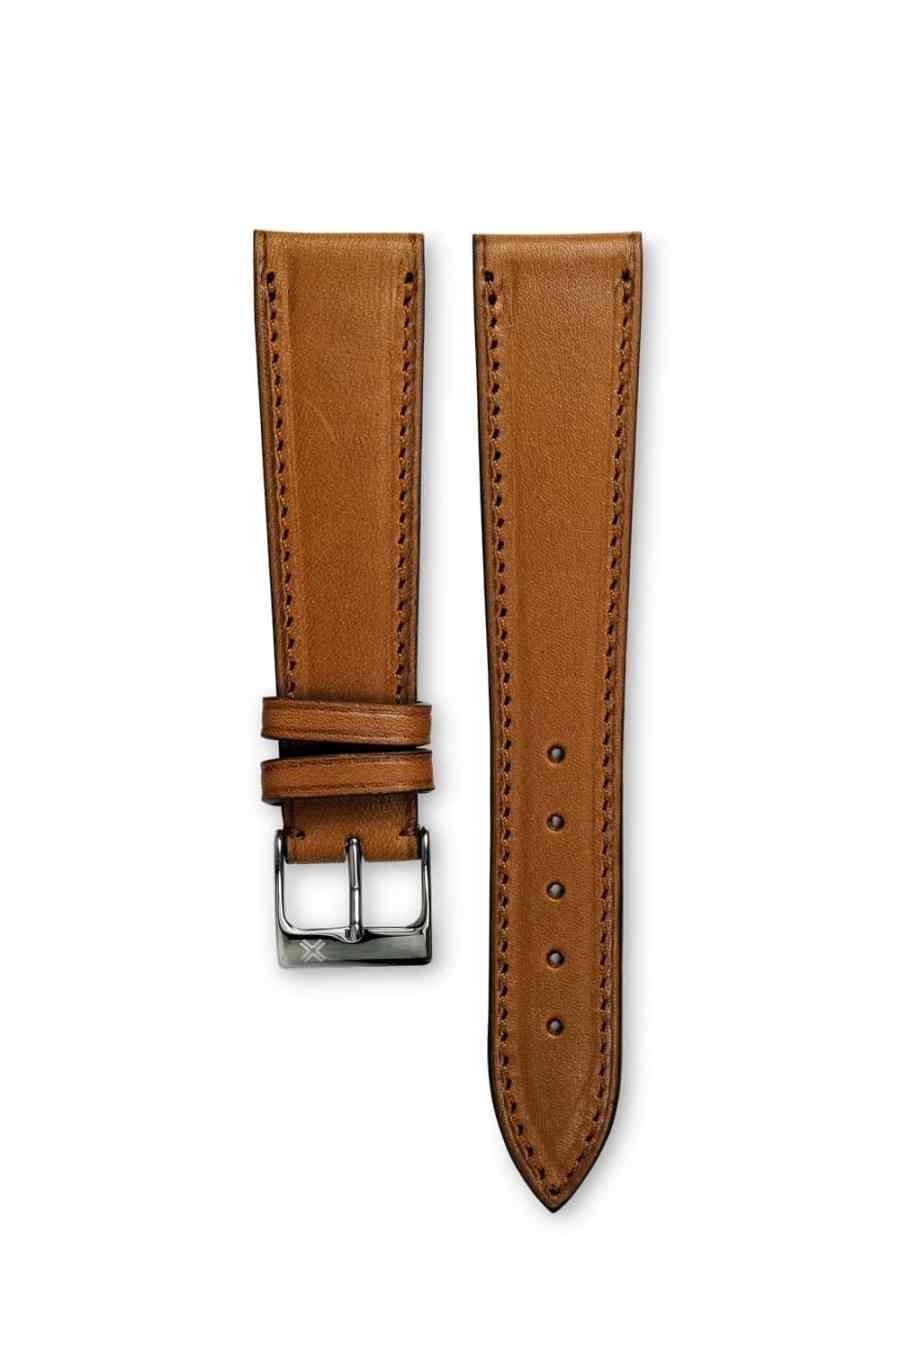 Smooth Classic Barenia light brown tan leather watch strap - tone on tone stitching - LUGS brand